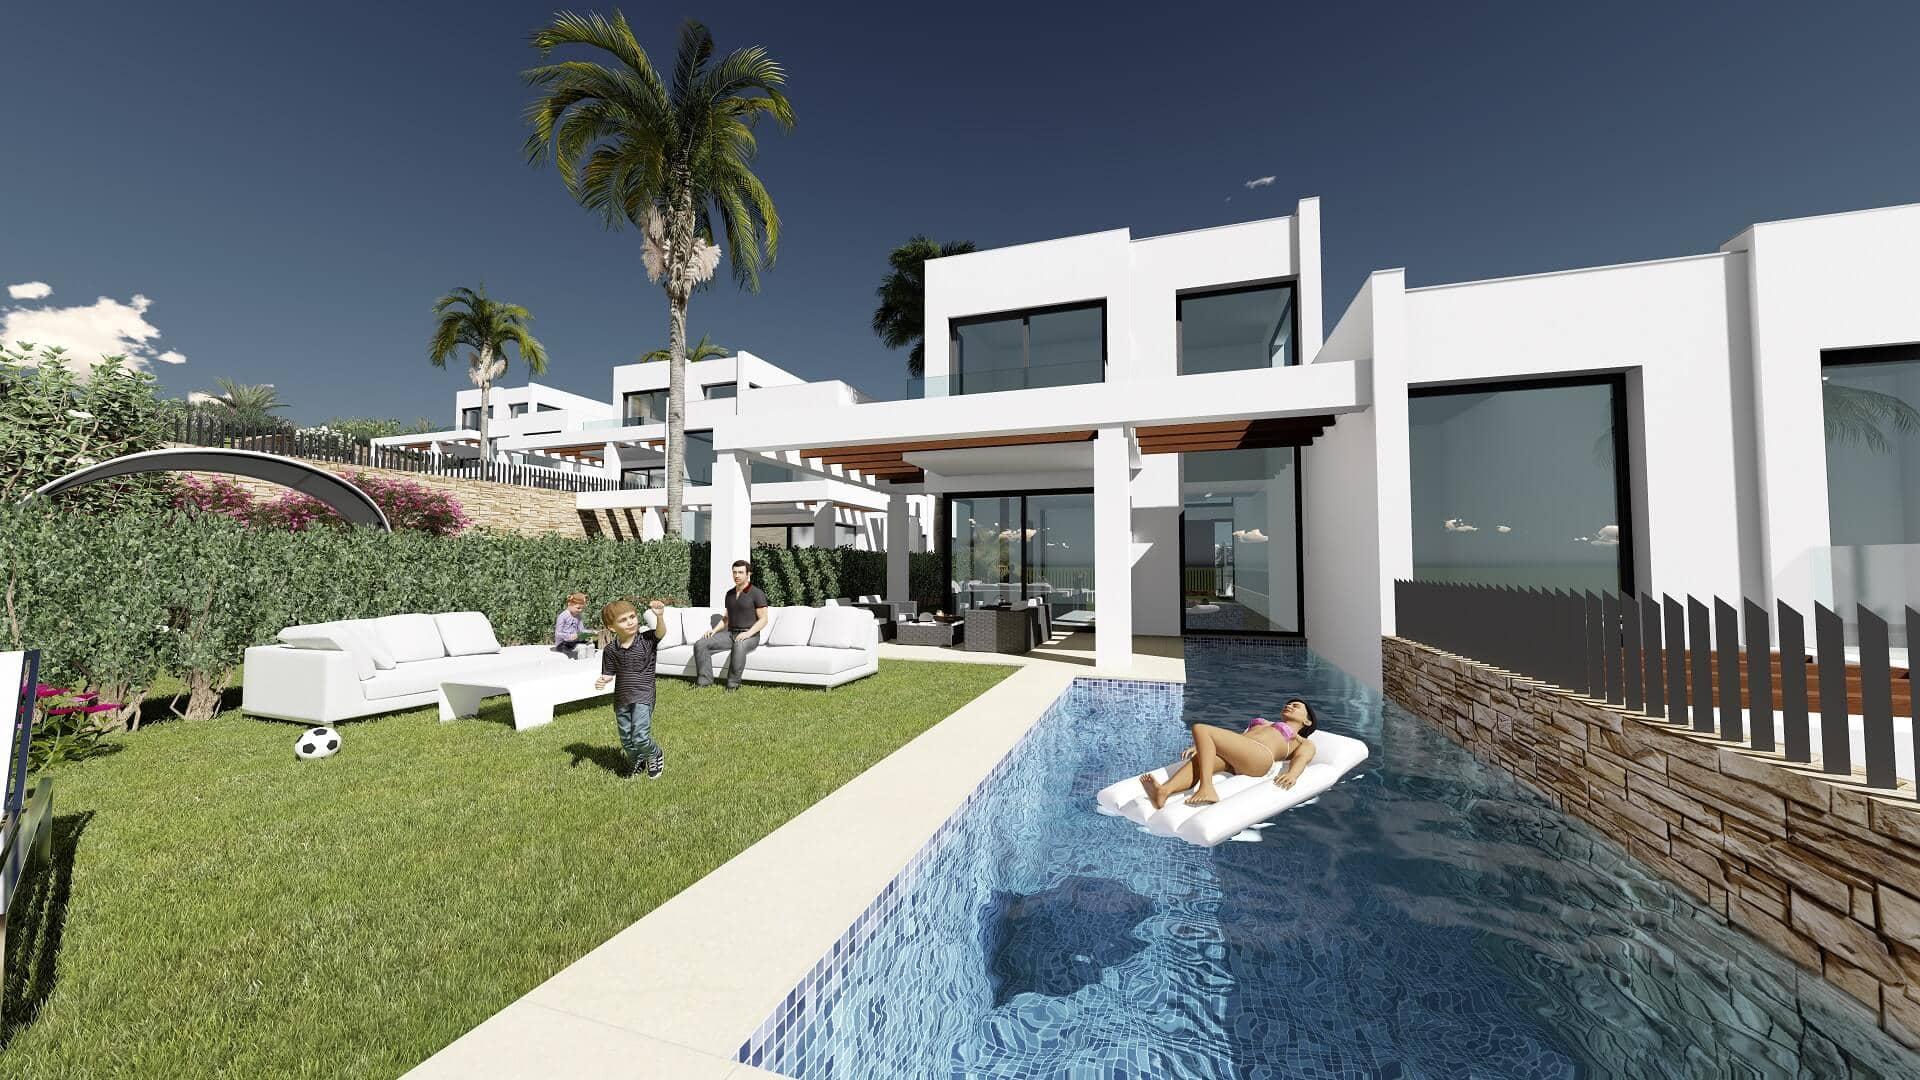 green hill cabopino villas oost marbella zeezicht tuin zwembad